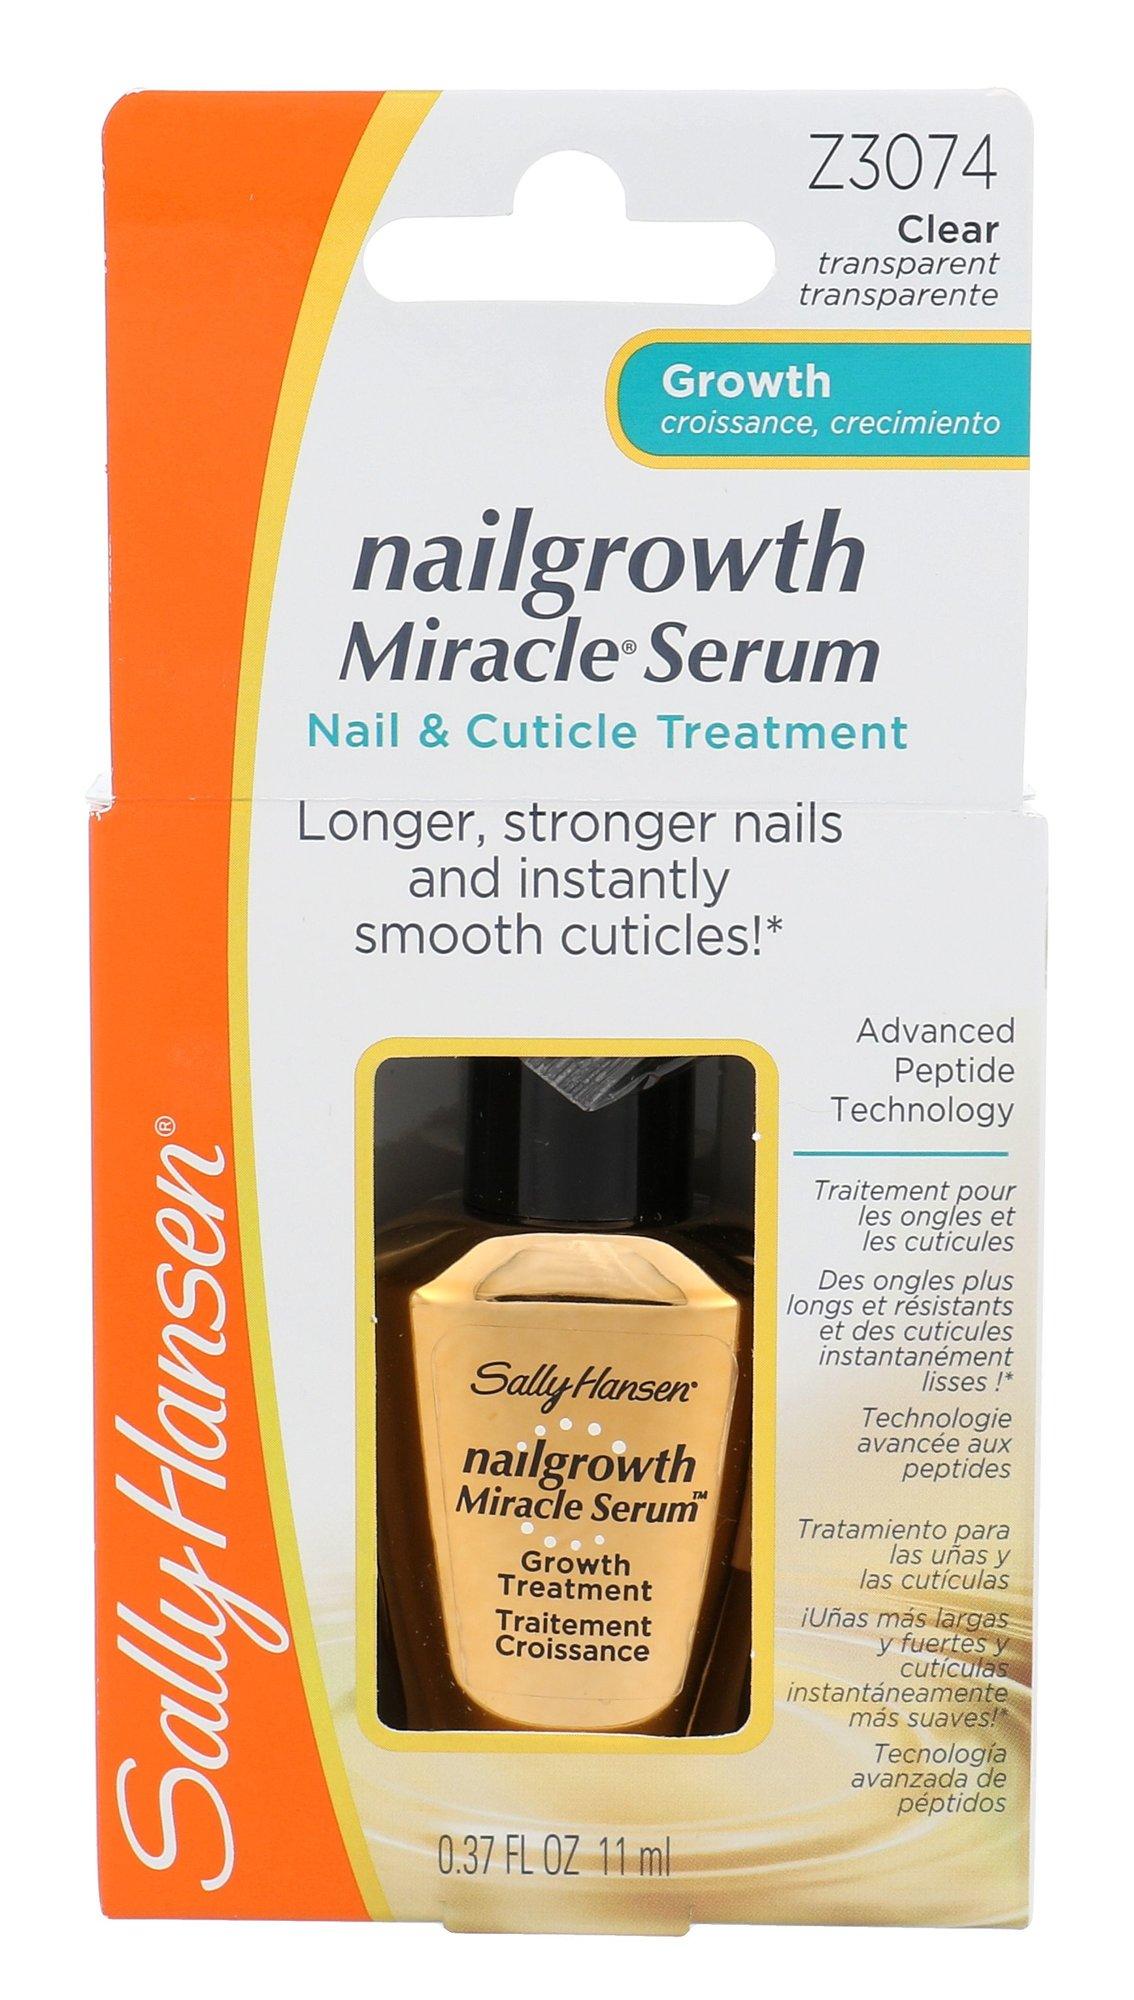 Sally Hansen Nailgrowth Miracle Serum Cosmetic 11ml Clear